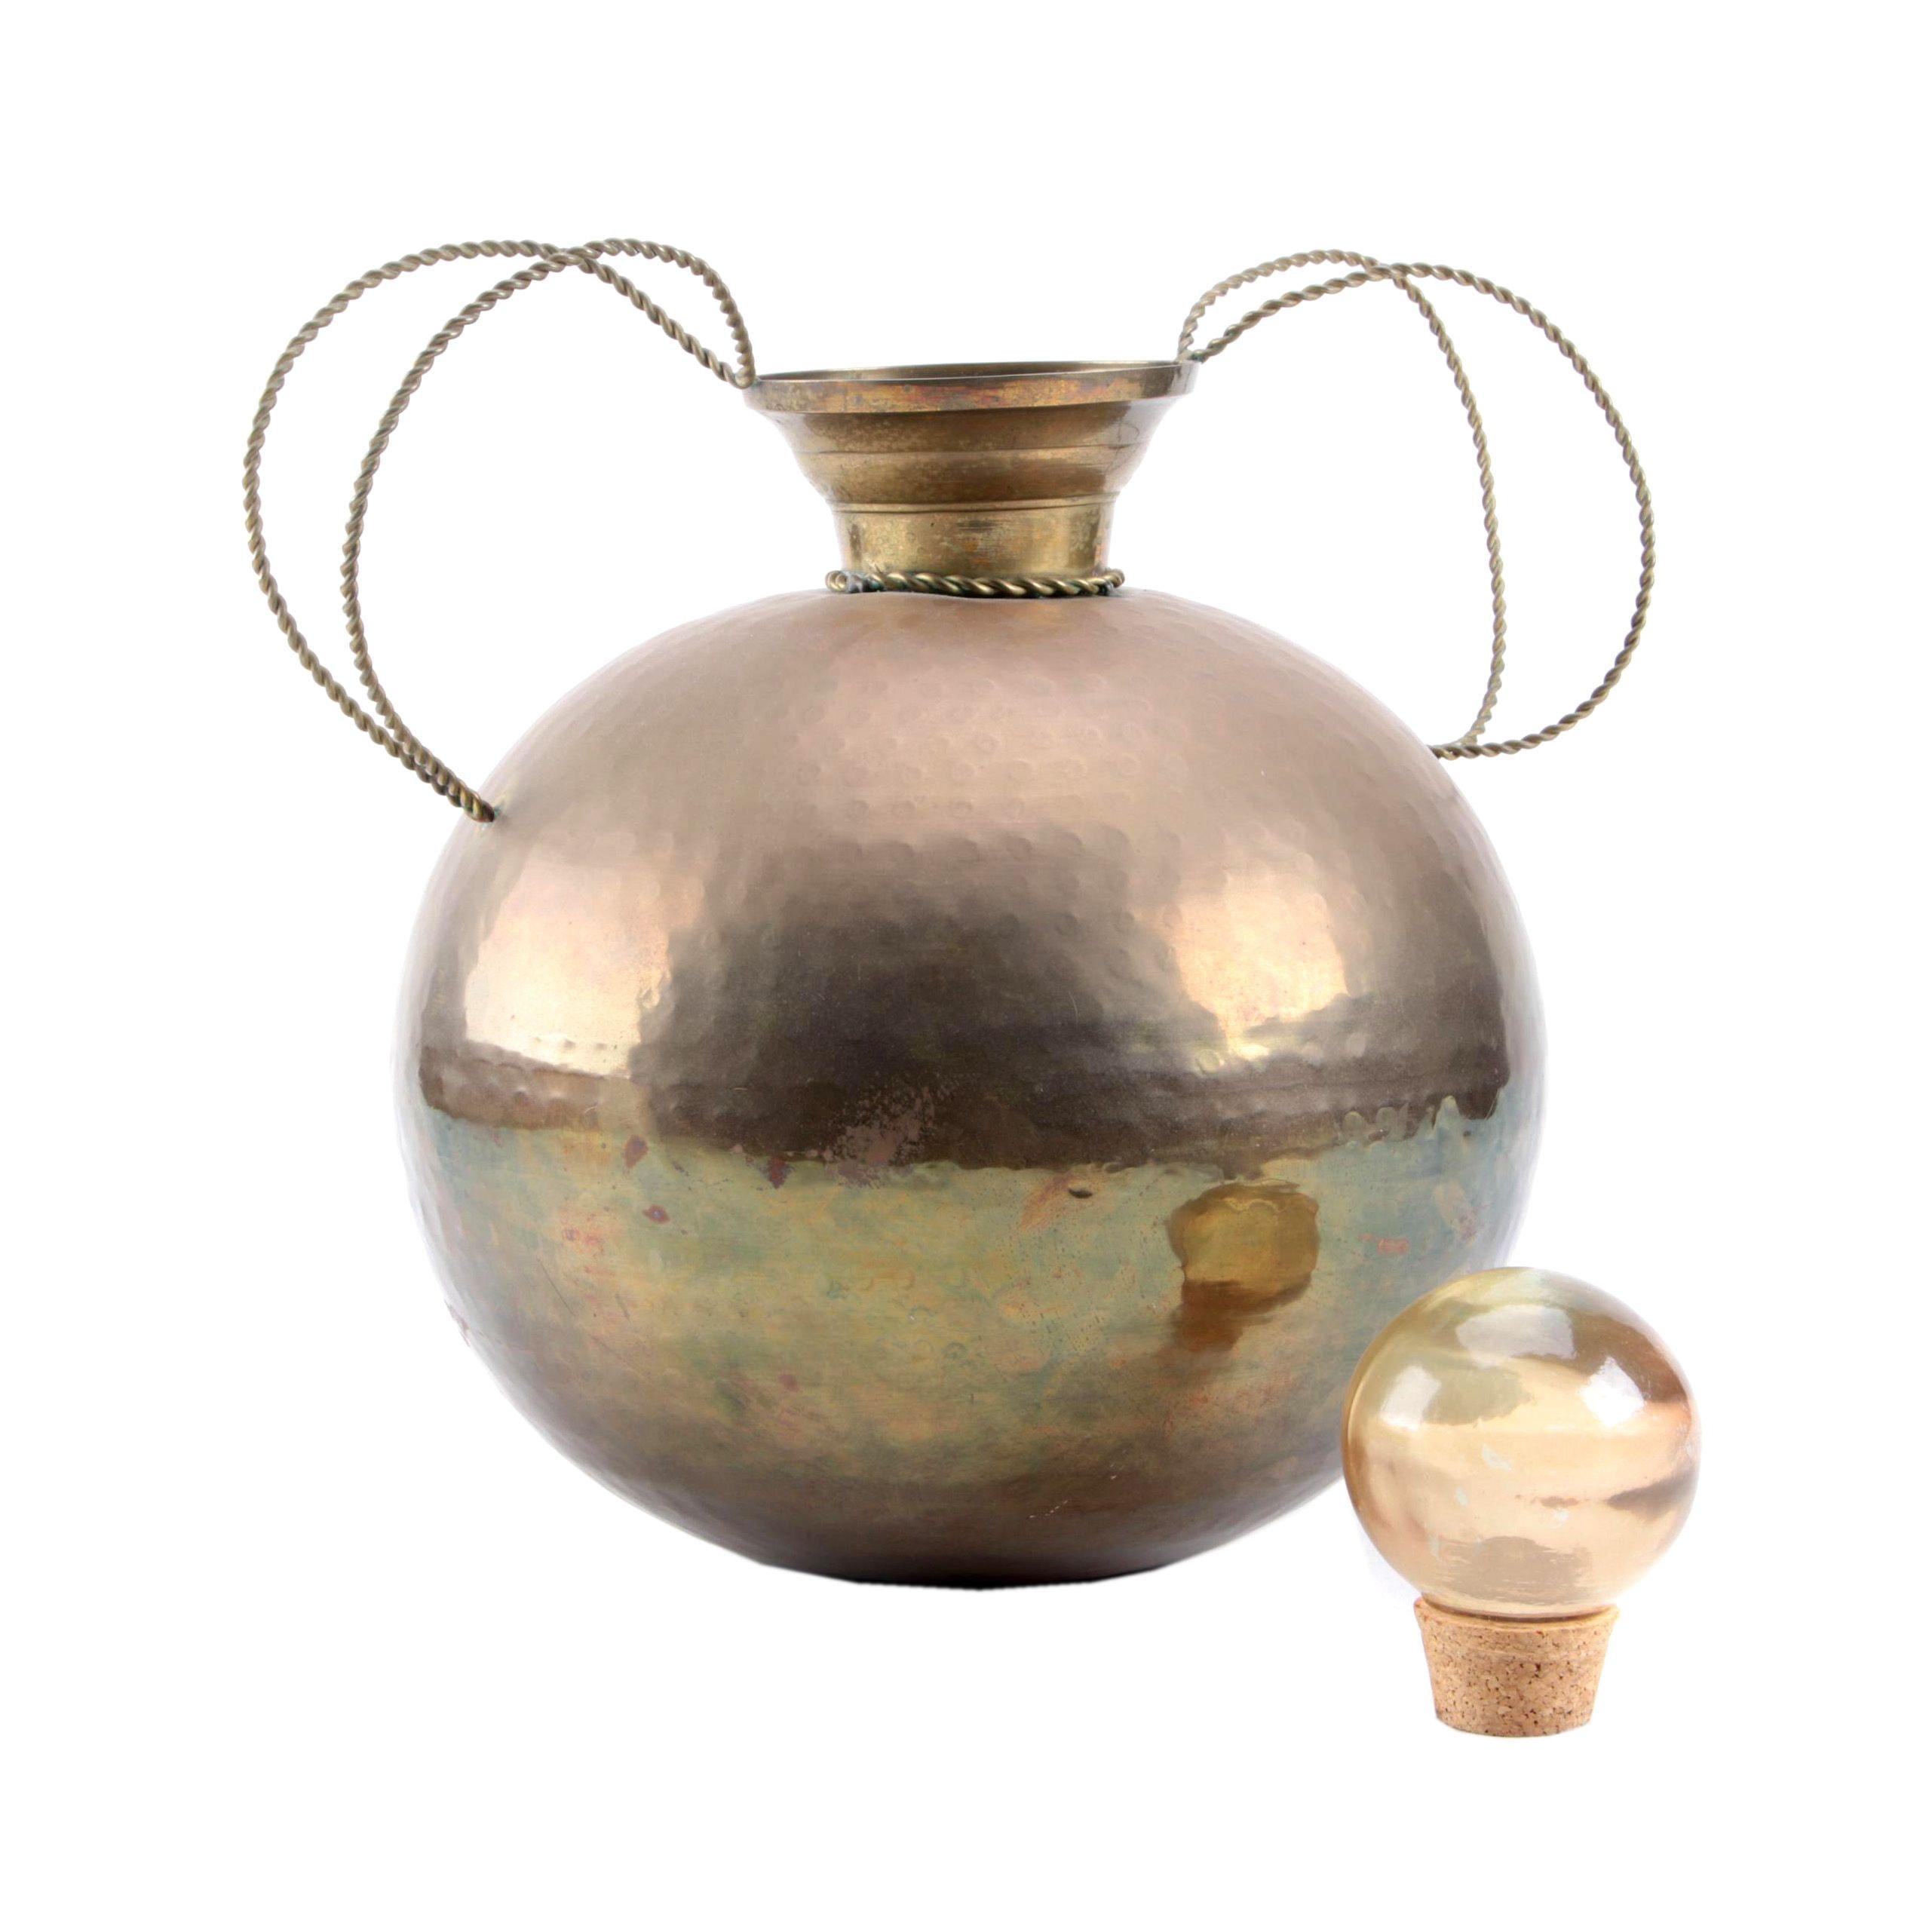 Indian Brass Vessel